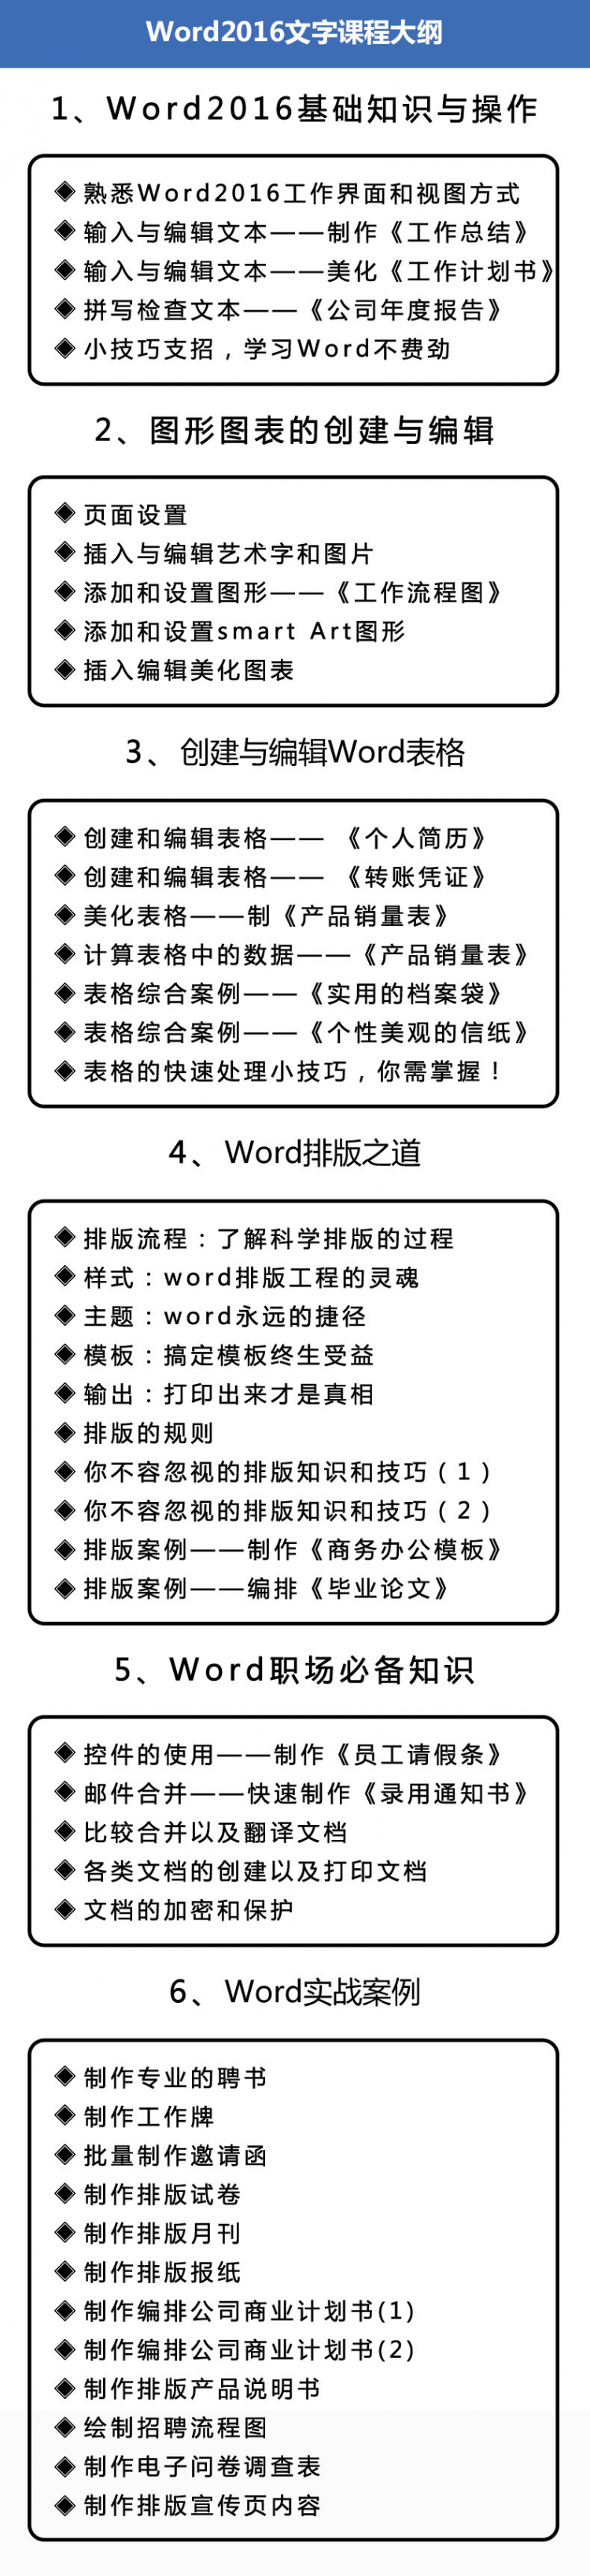 4word文字课程大纲.jpg